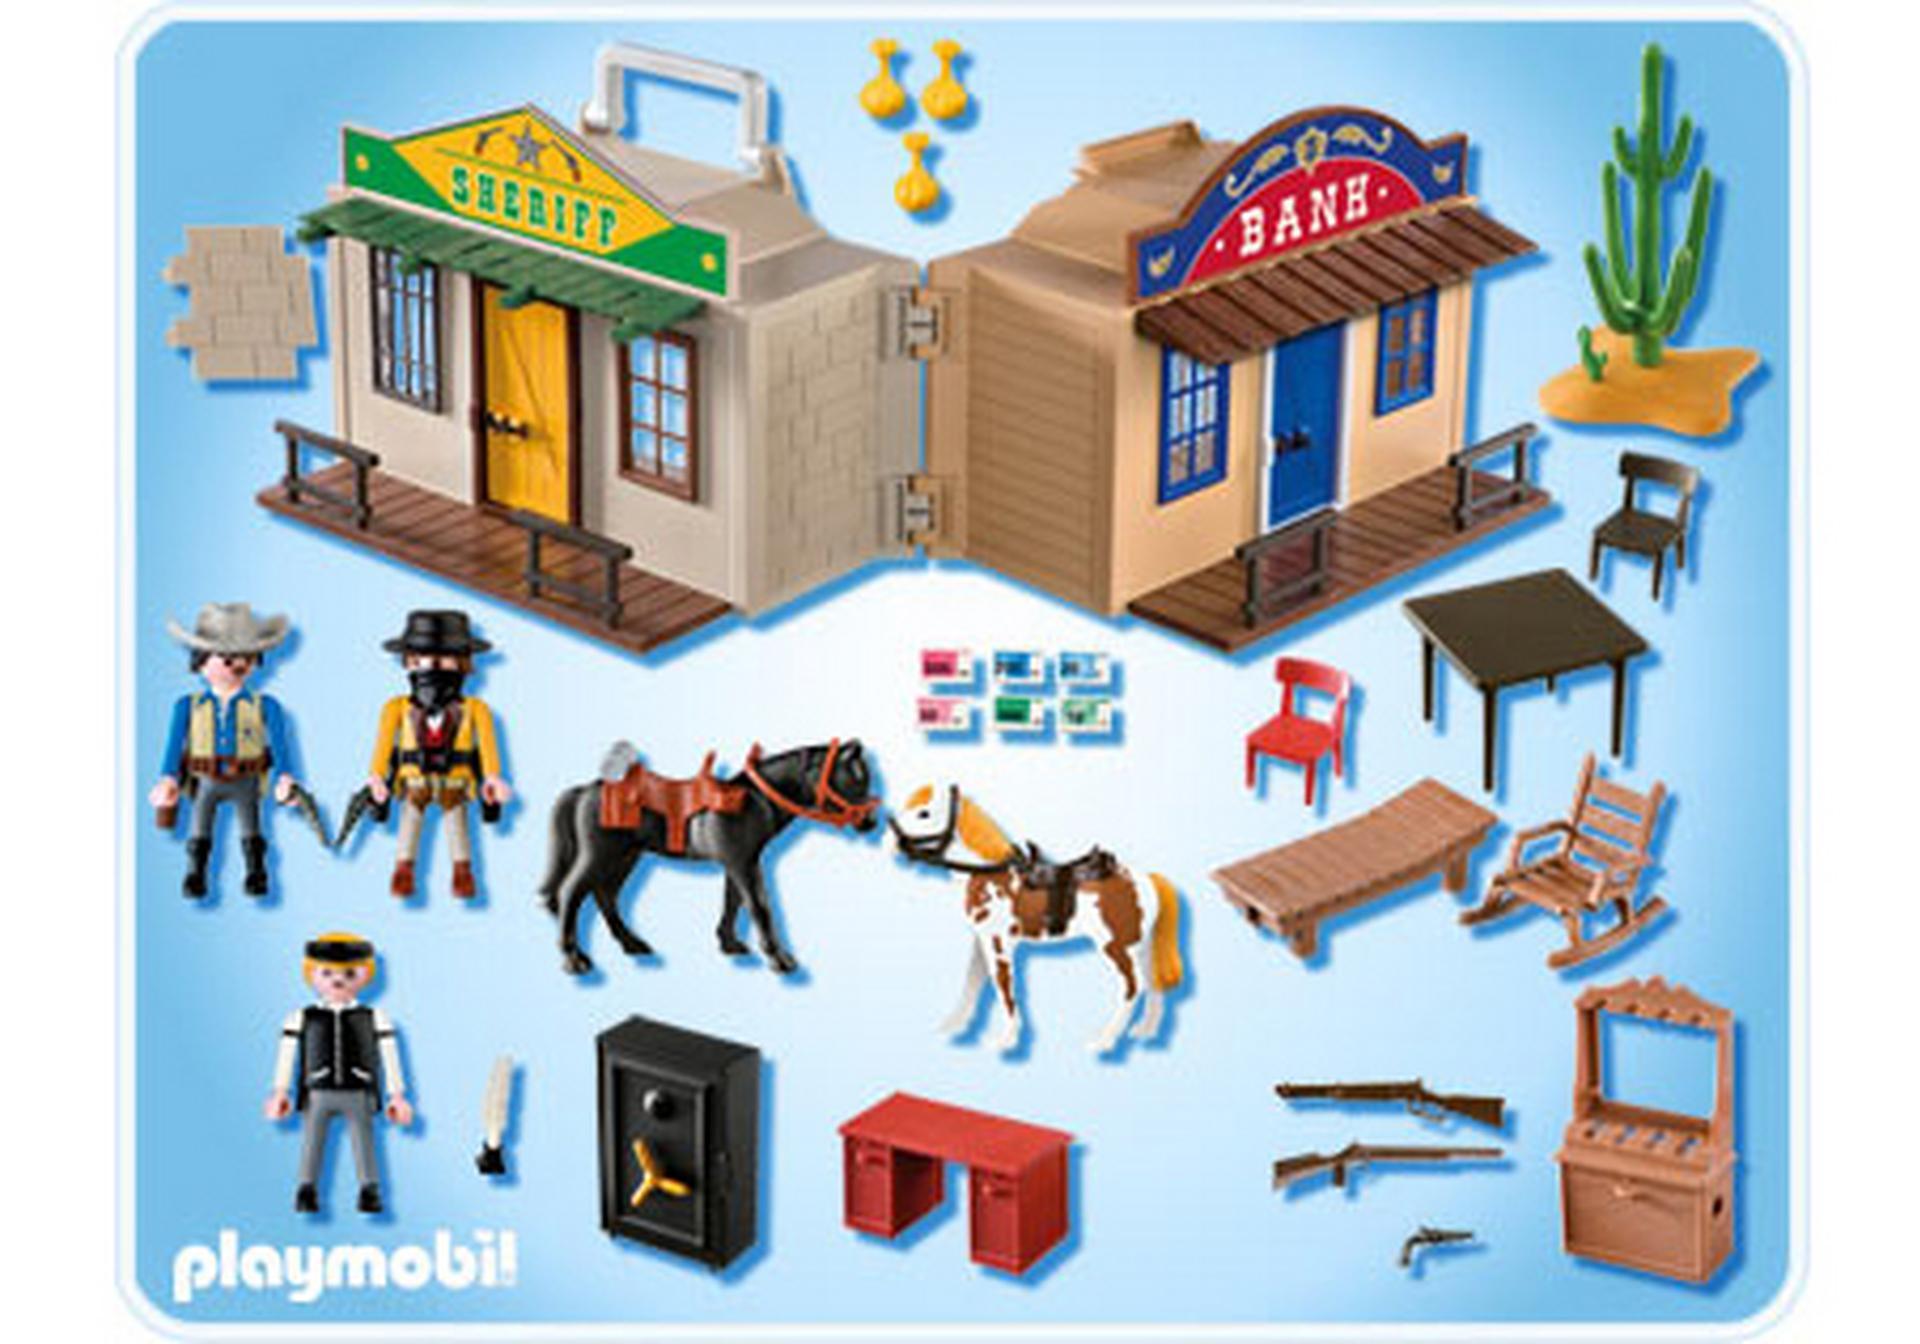 mitnehm westerncity 4398 a playmobil deutschland. Black Bedroom Furniture Sets. Home Design Ideas